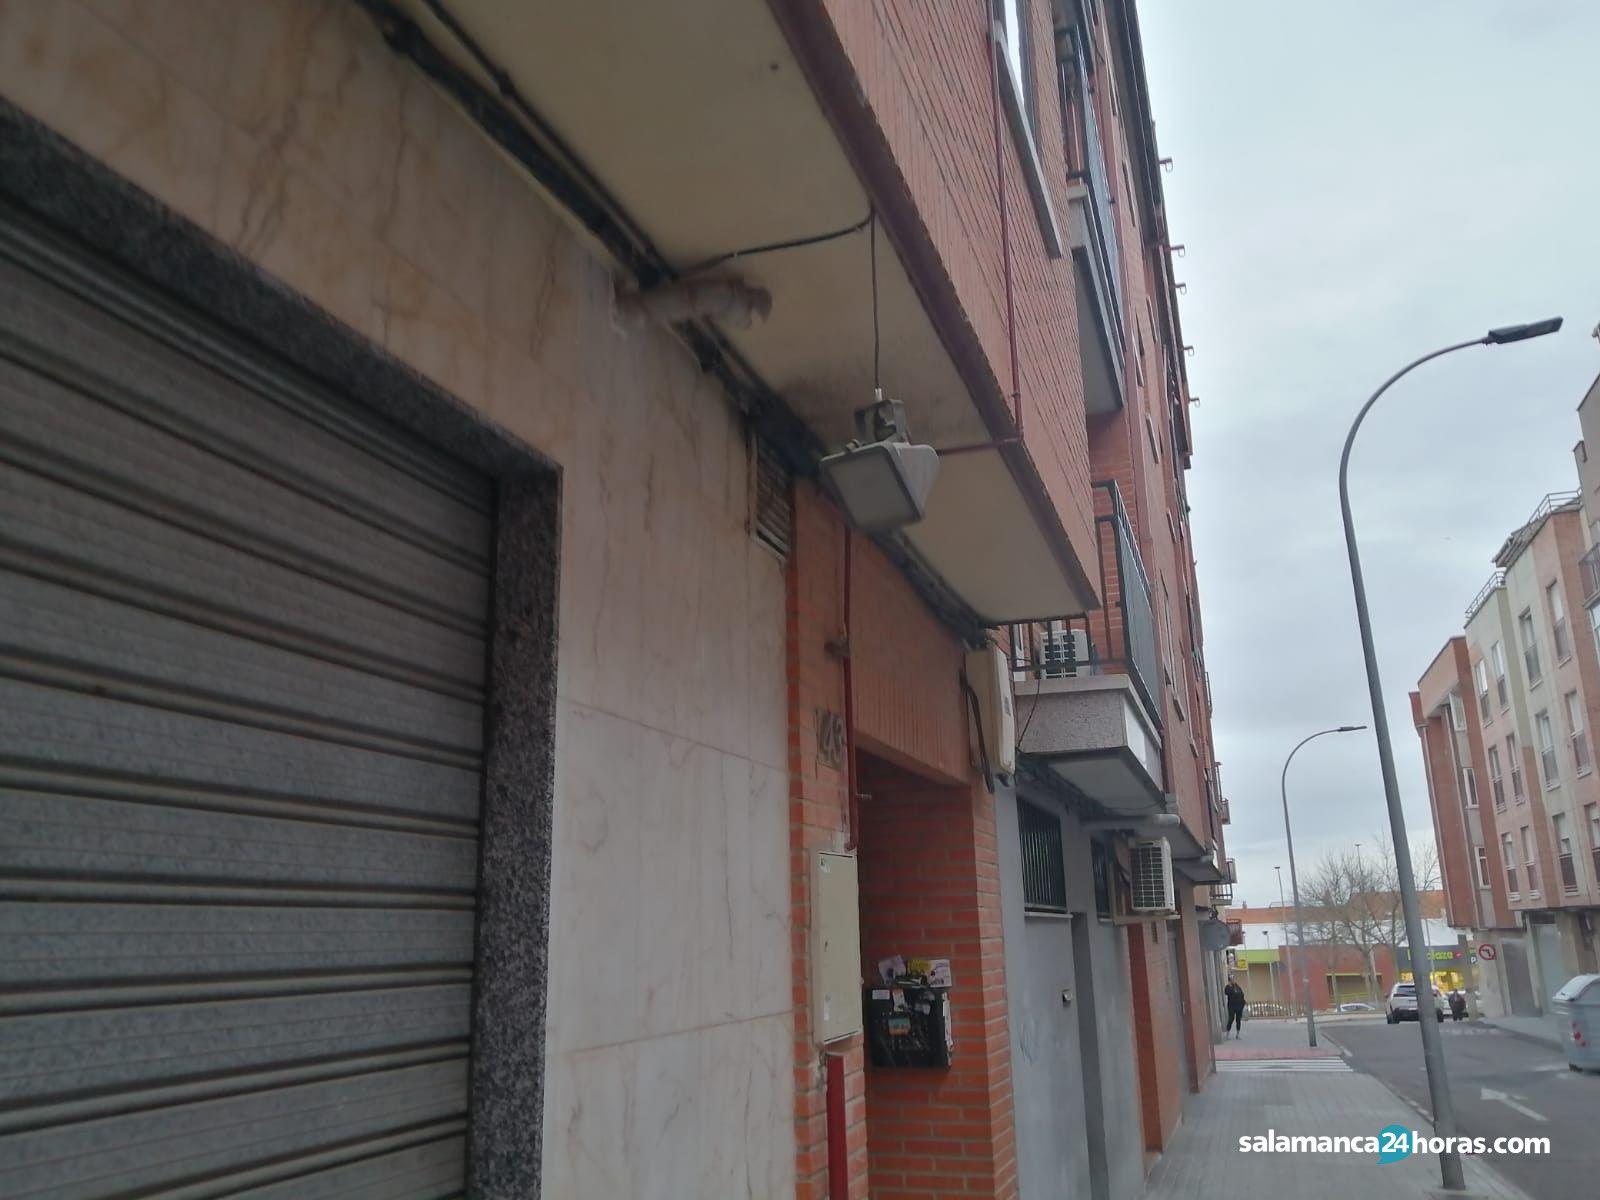 Bomberos calle almansa (1)